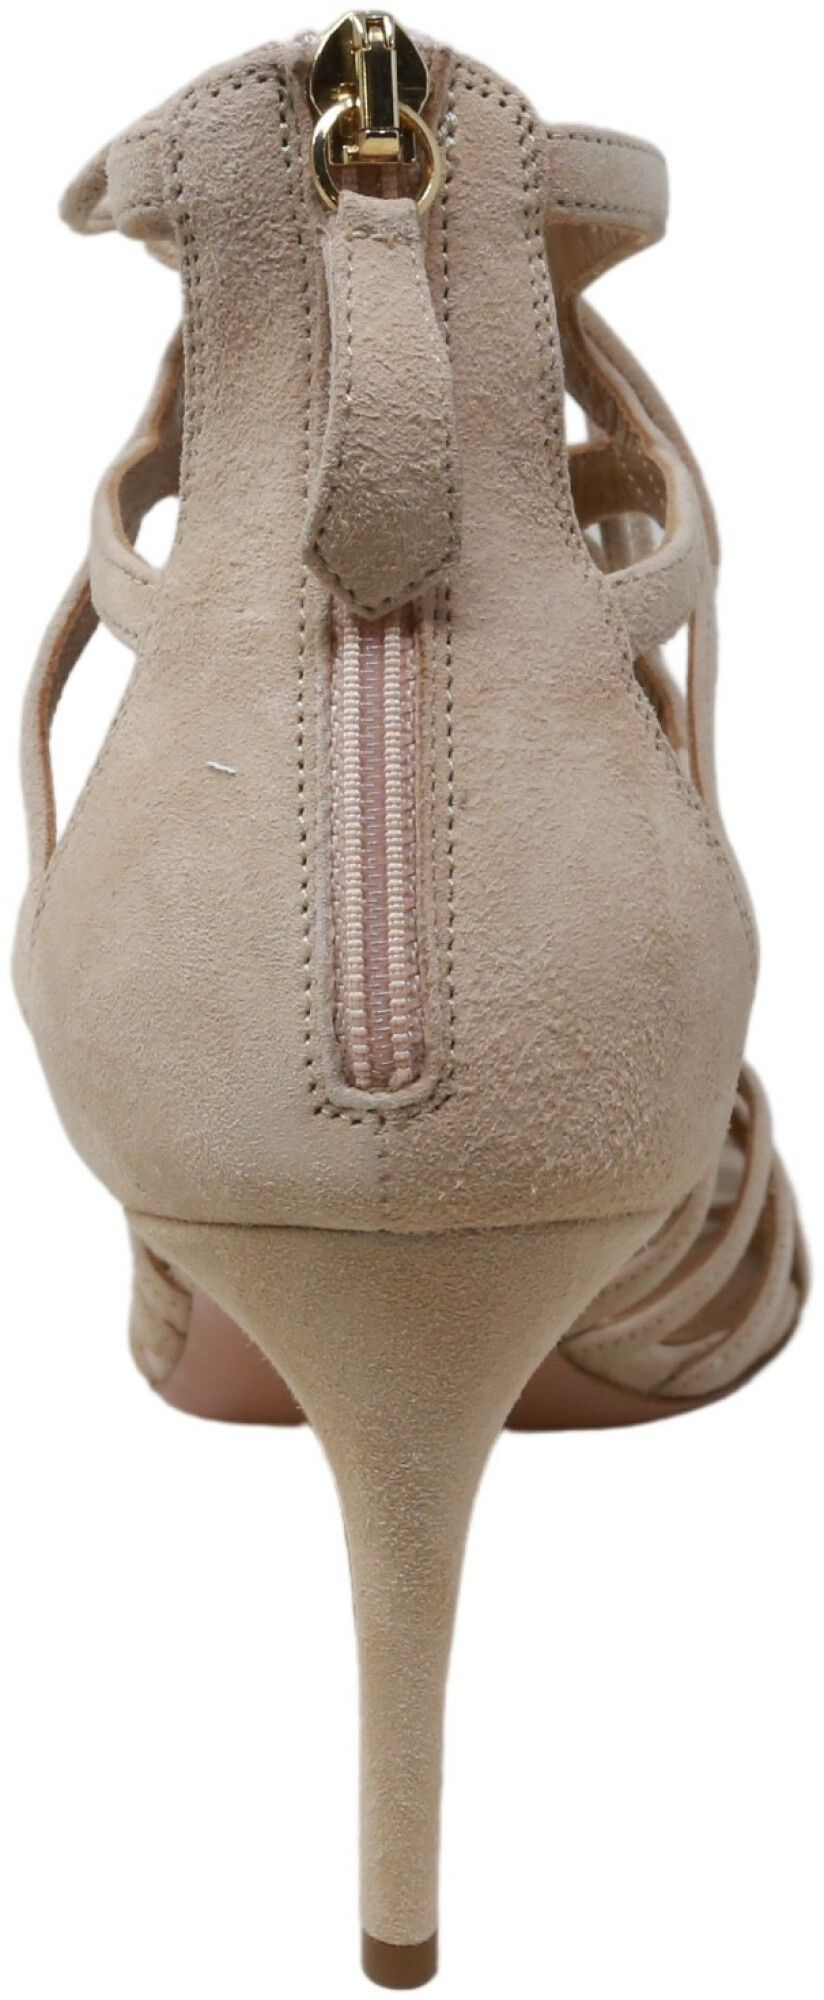 Aquazzura Firenze Women's Ivy Sandal 75 High-Top Leather Pump